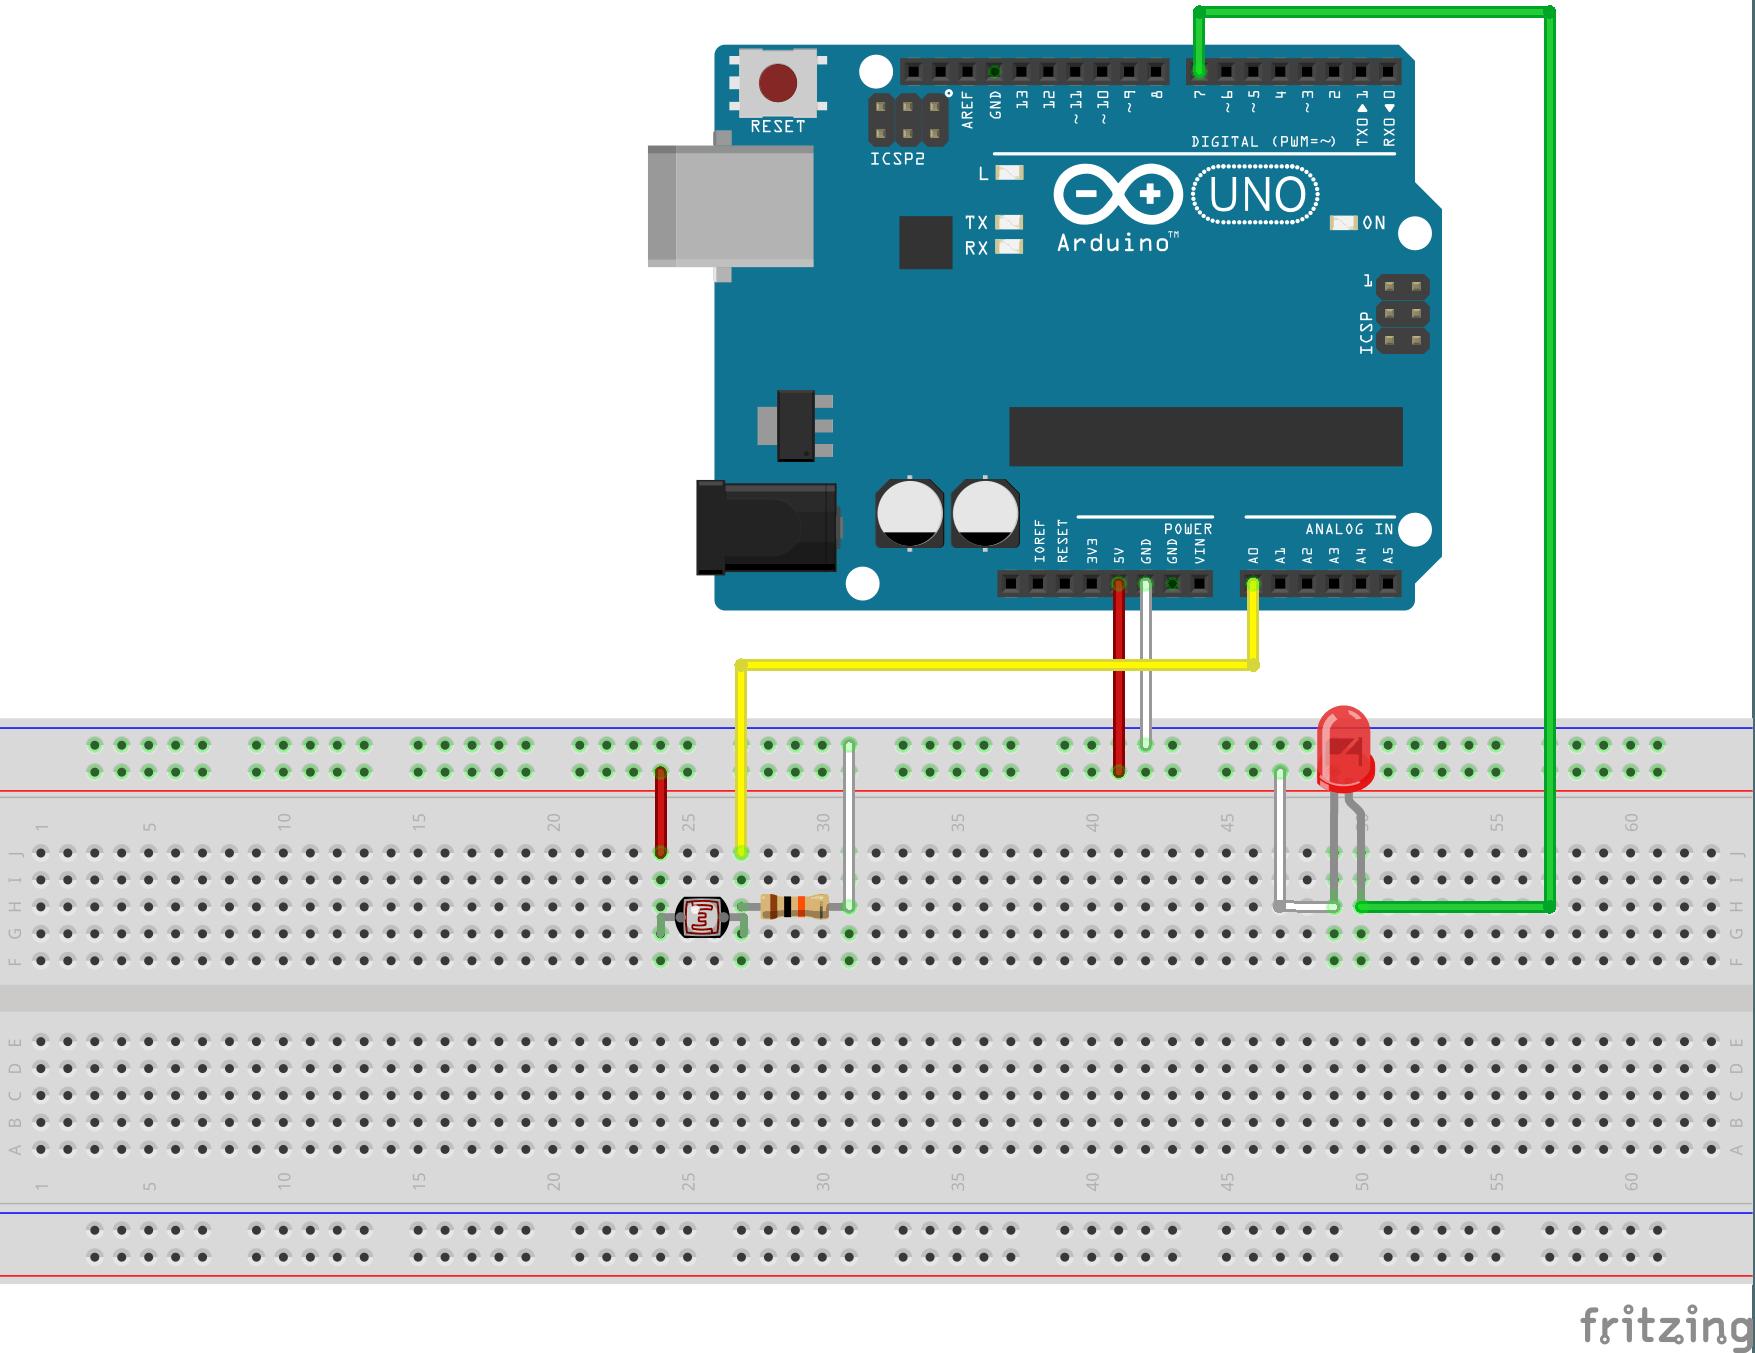 LED/Light Control using LDR